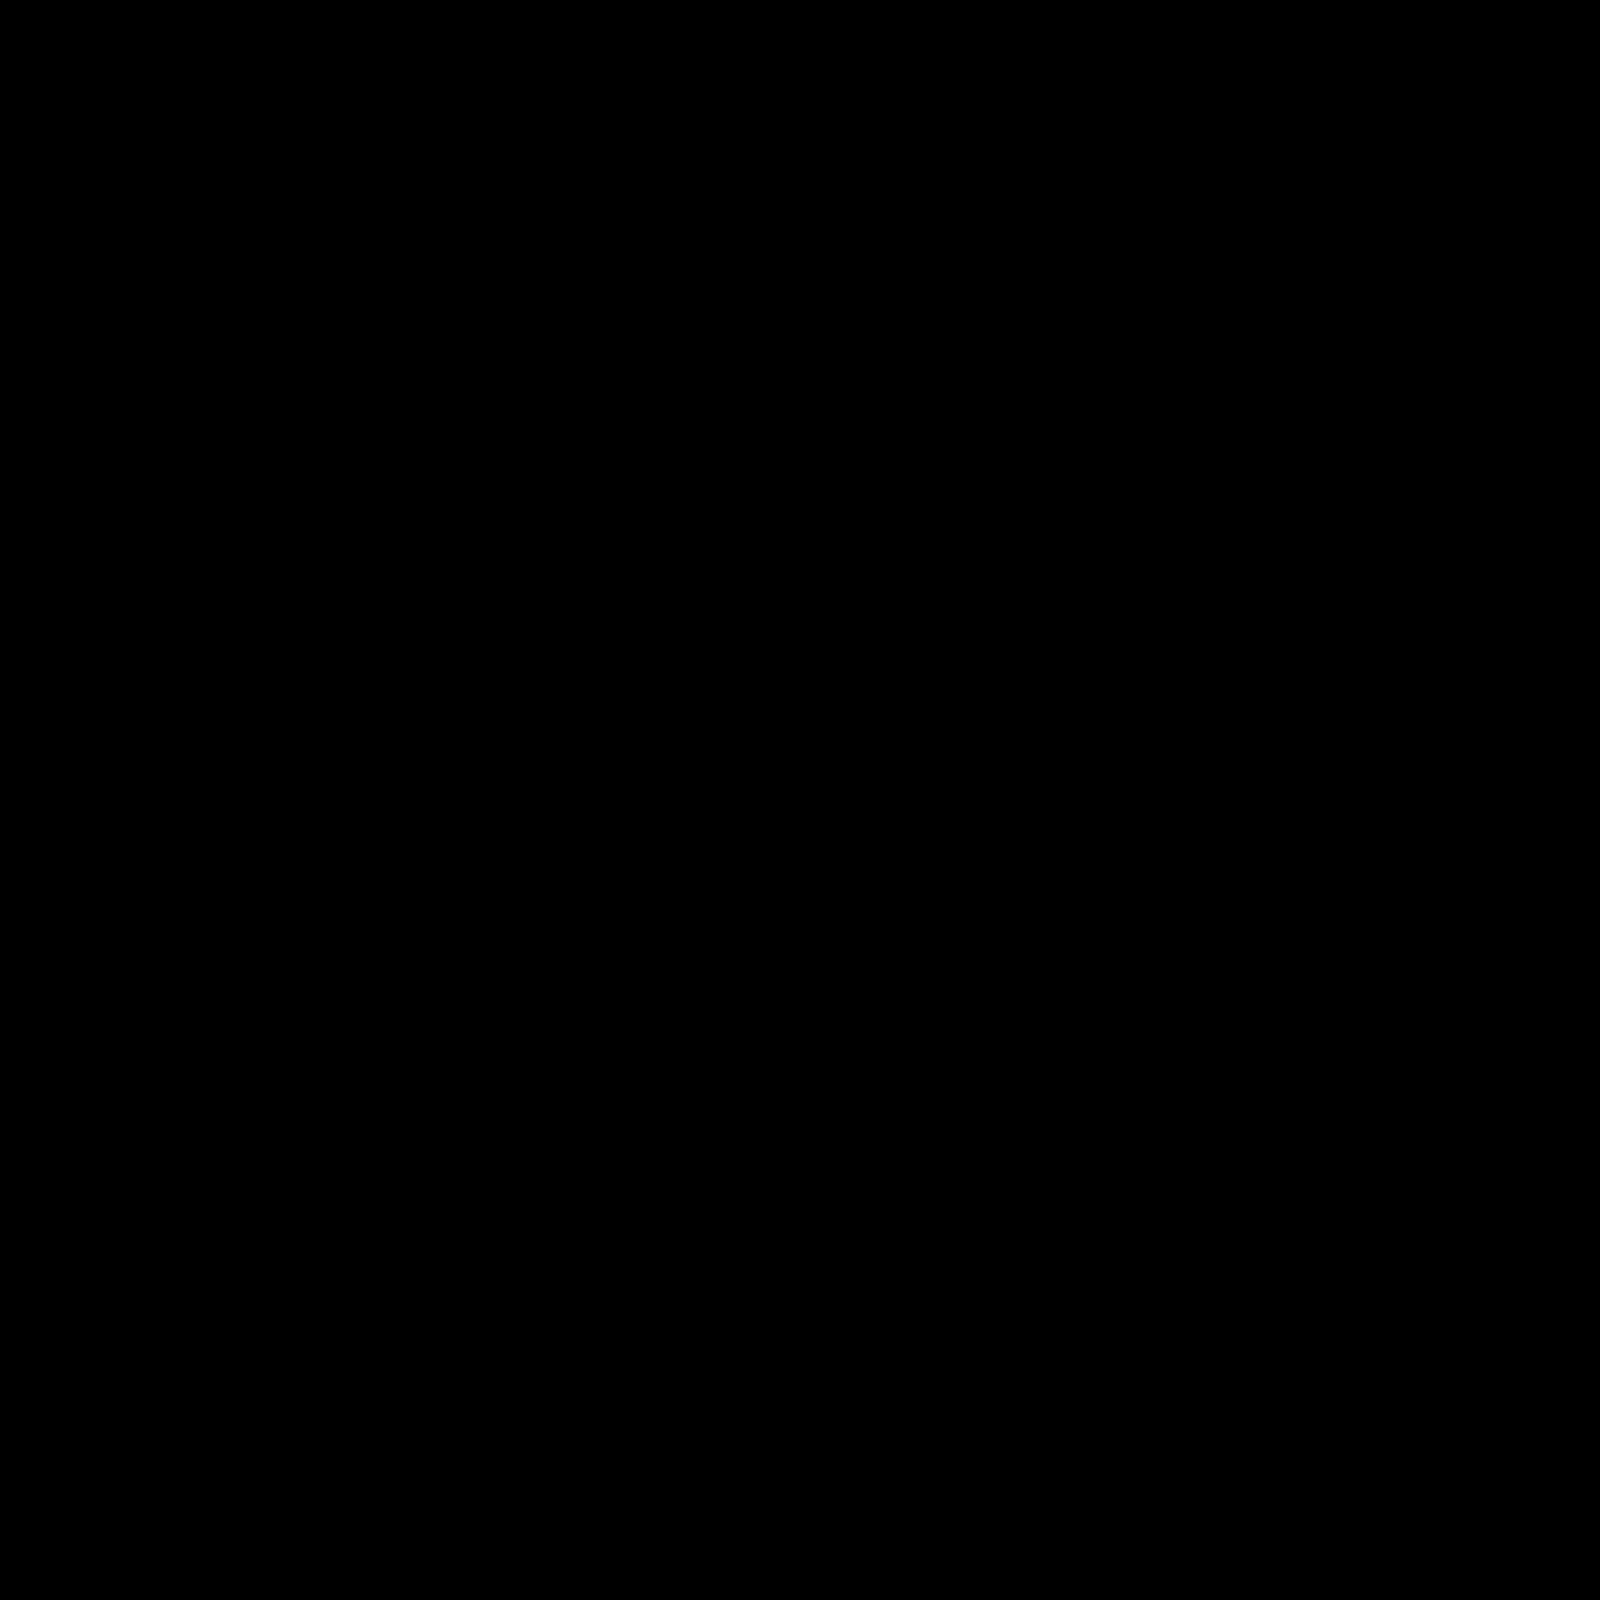 Minecraft Shovel Filled icon